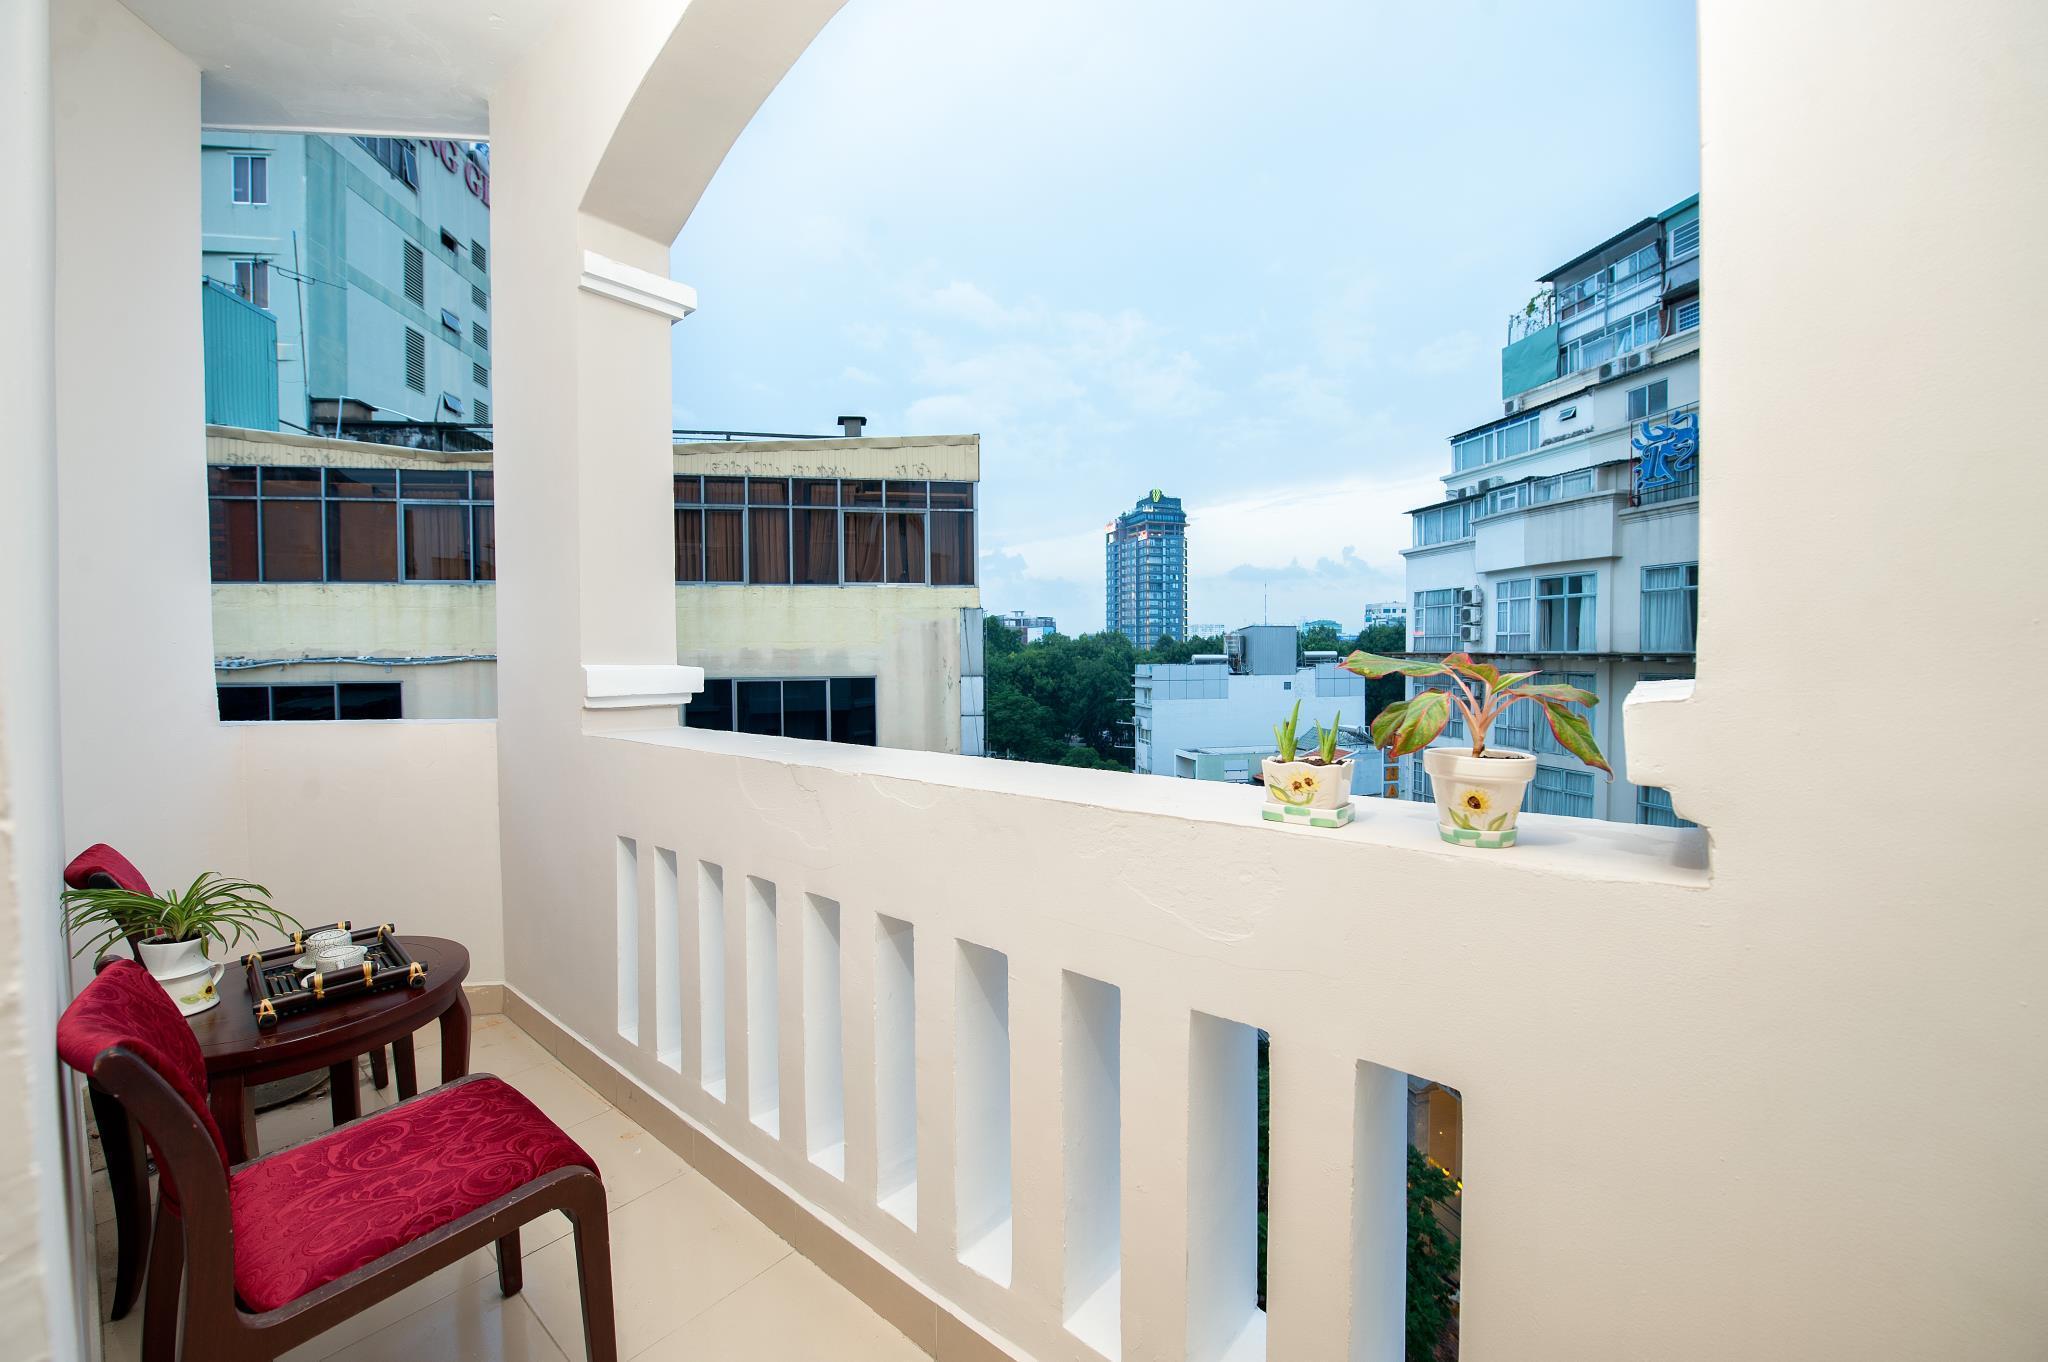 BALI BOUTIQUE BEN THANH HOTEL